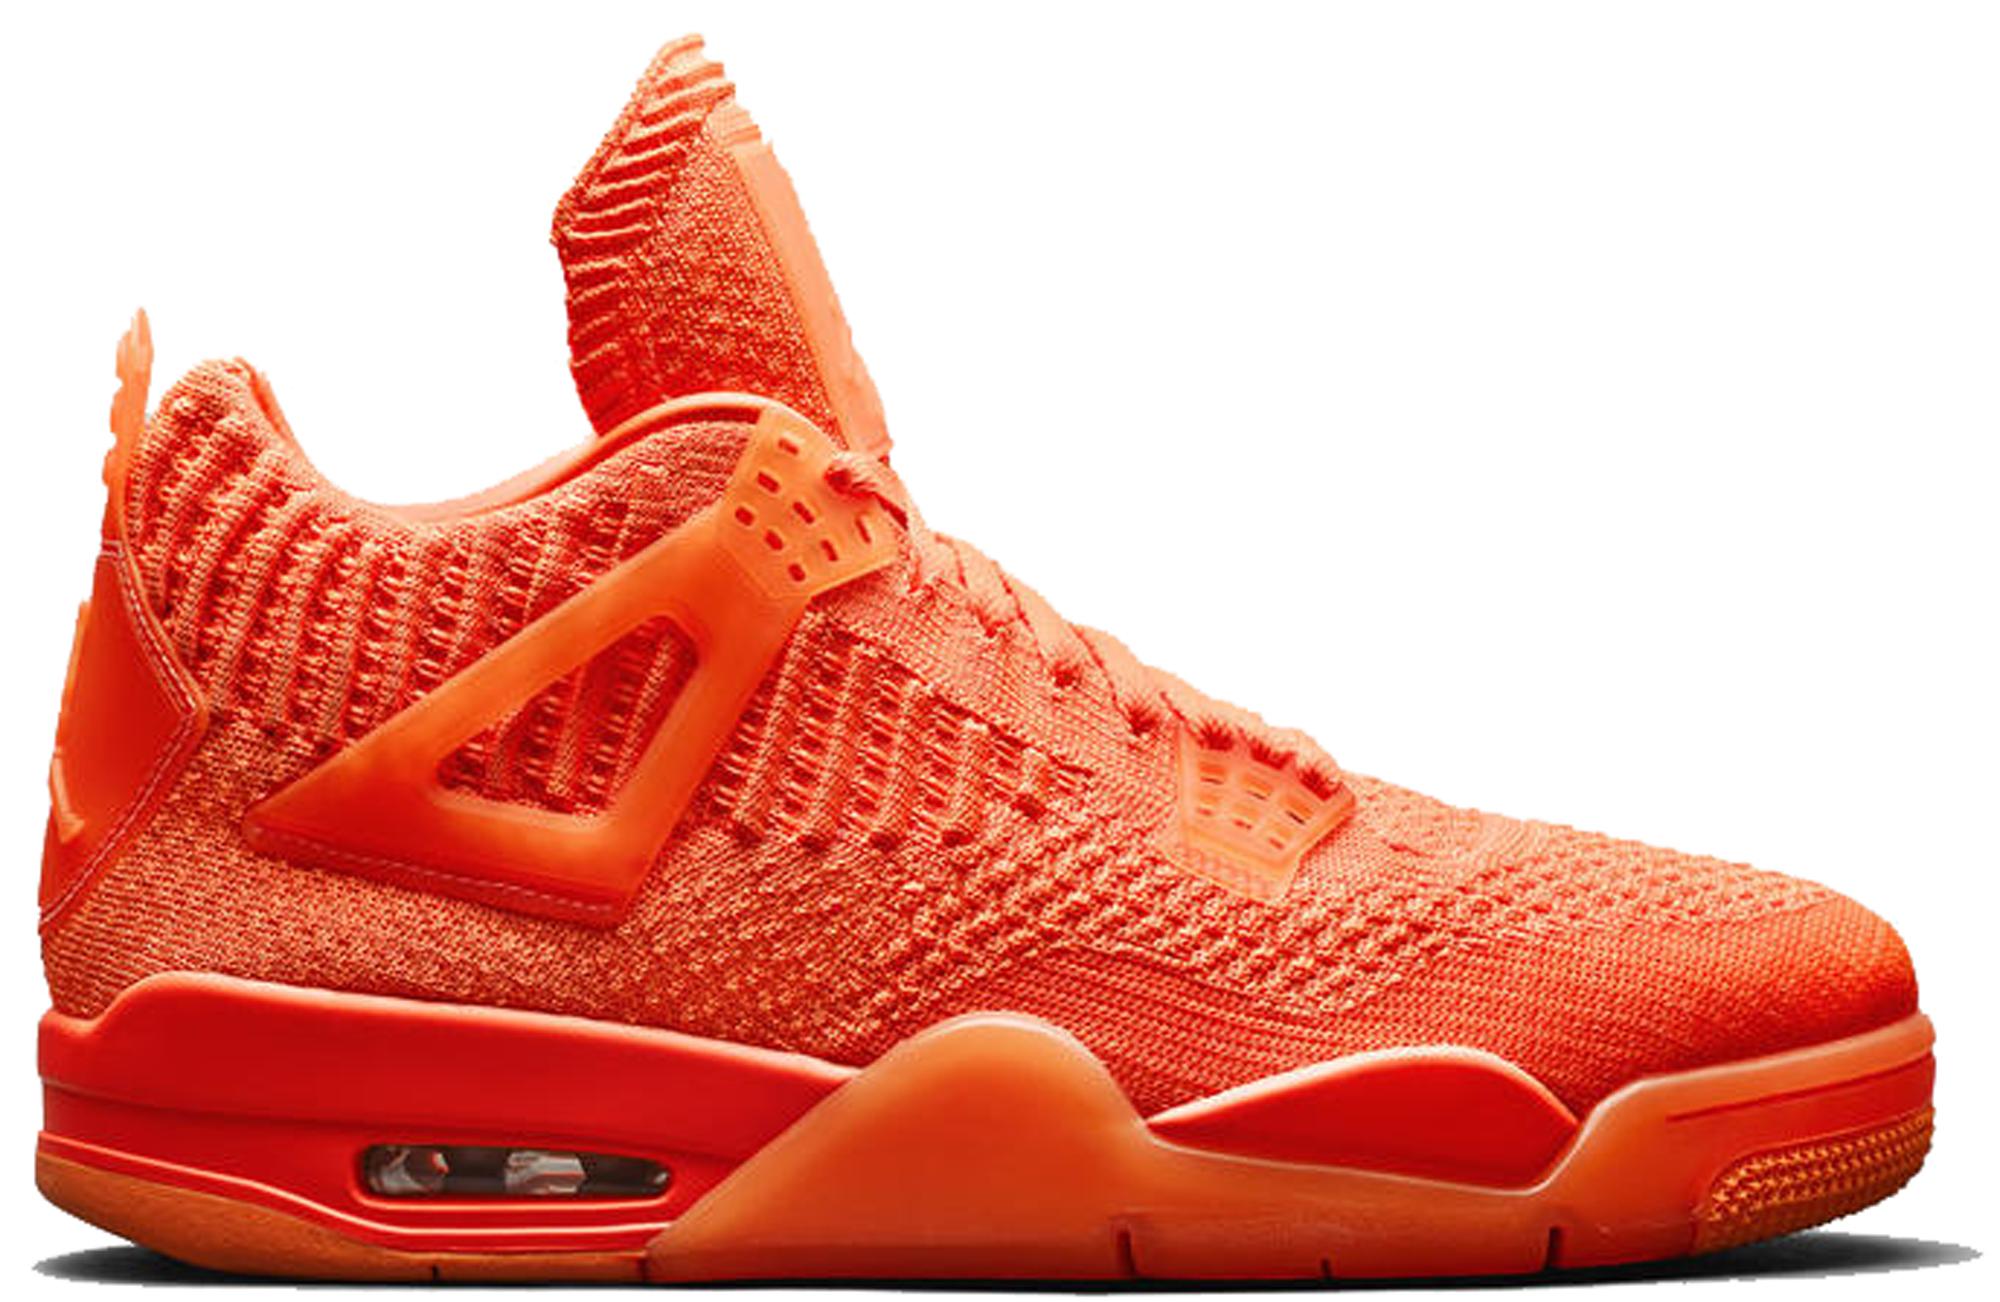 Jordan 4 Retro Flyknit Orange • Buy